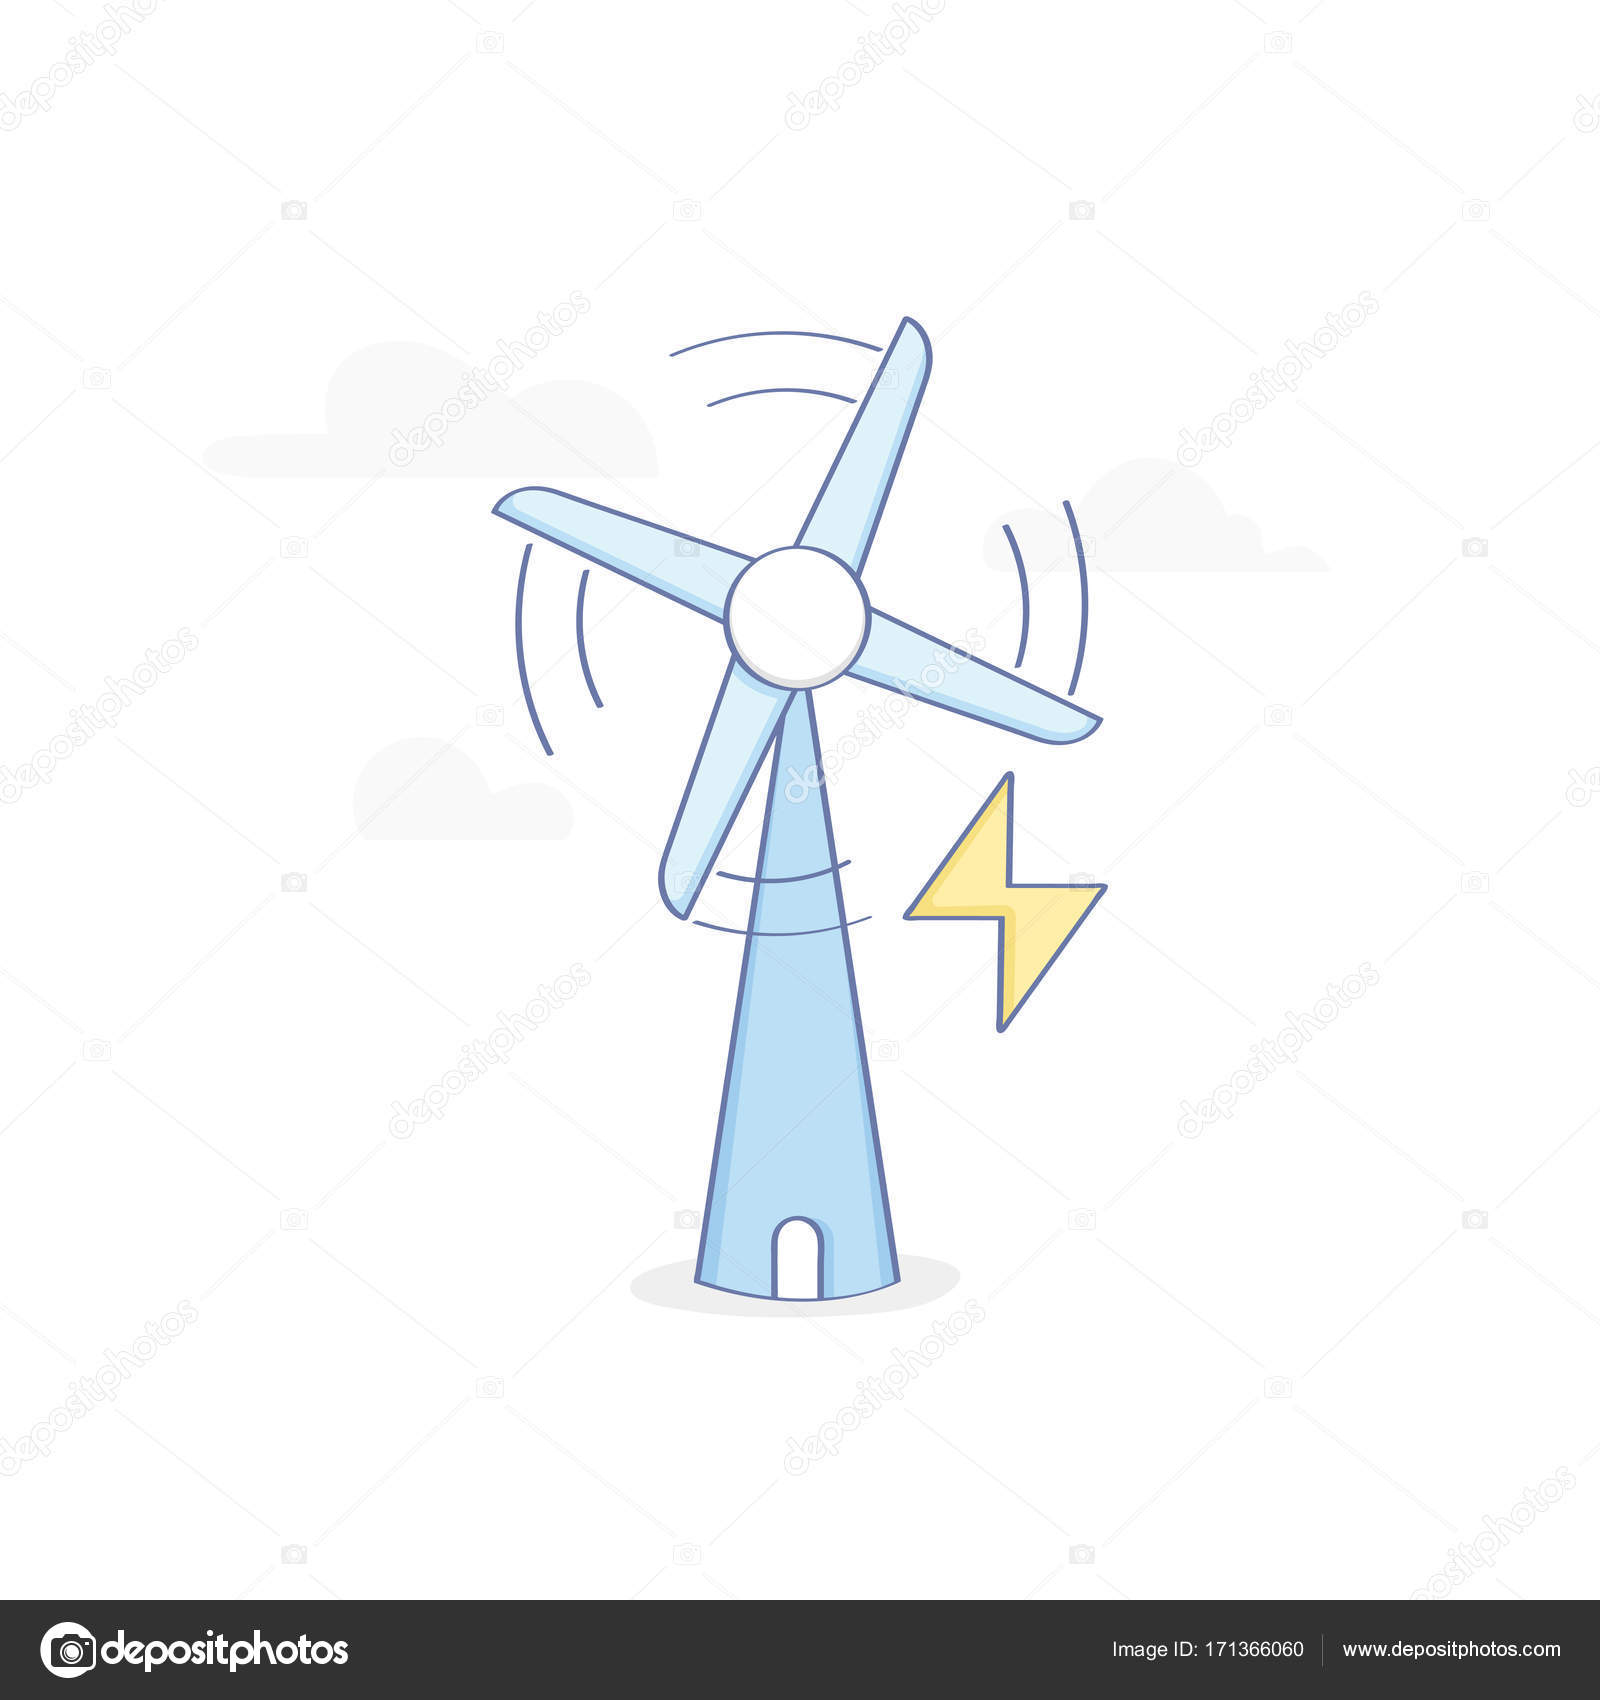 Eco Green Energy Wind Power Station Windmill Wind Turbine Symbol